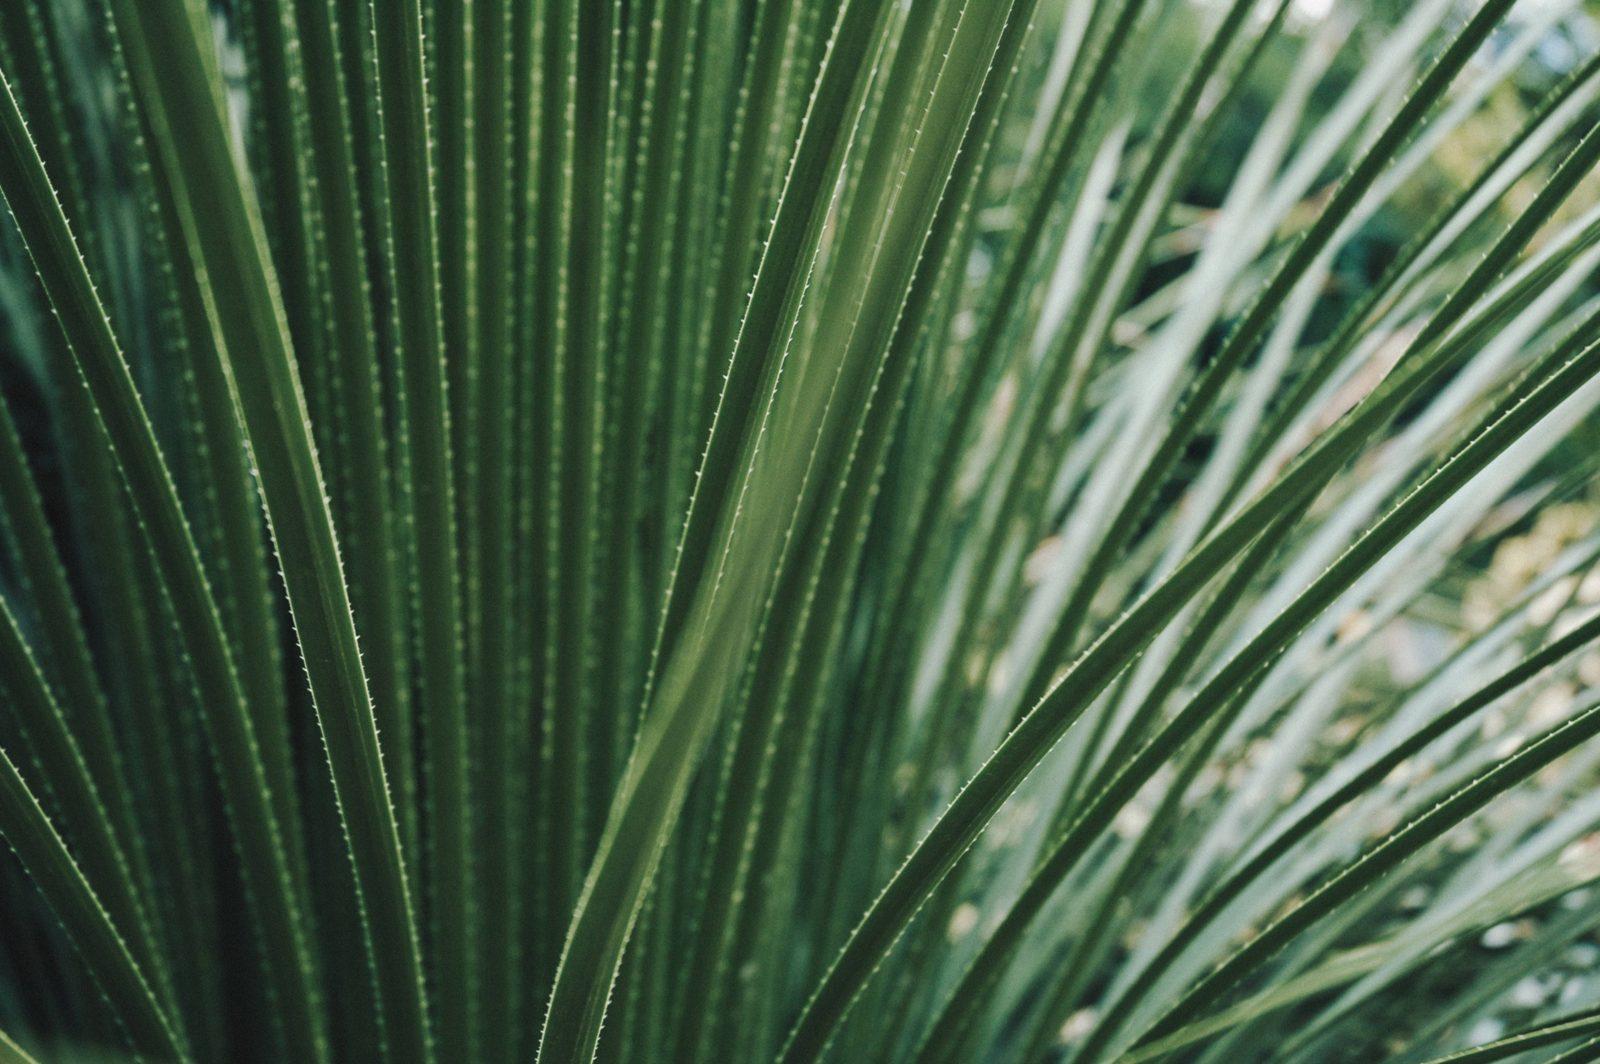 Large Cactus Leaves